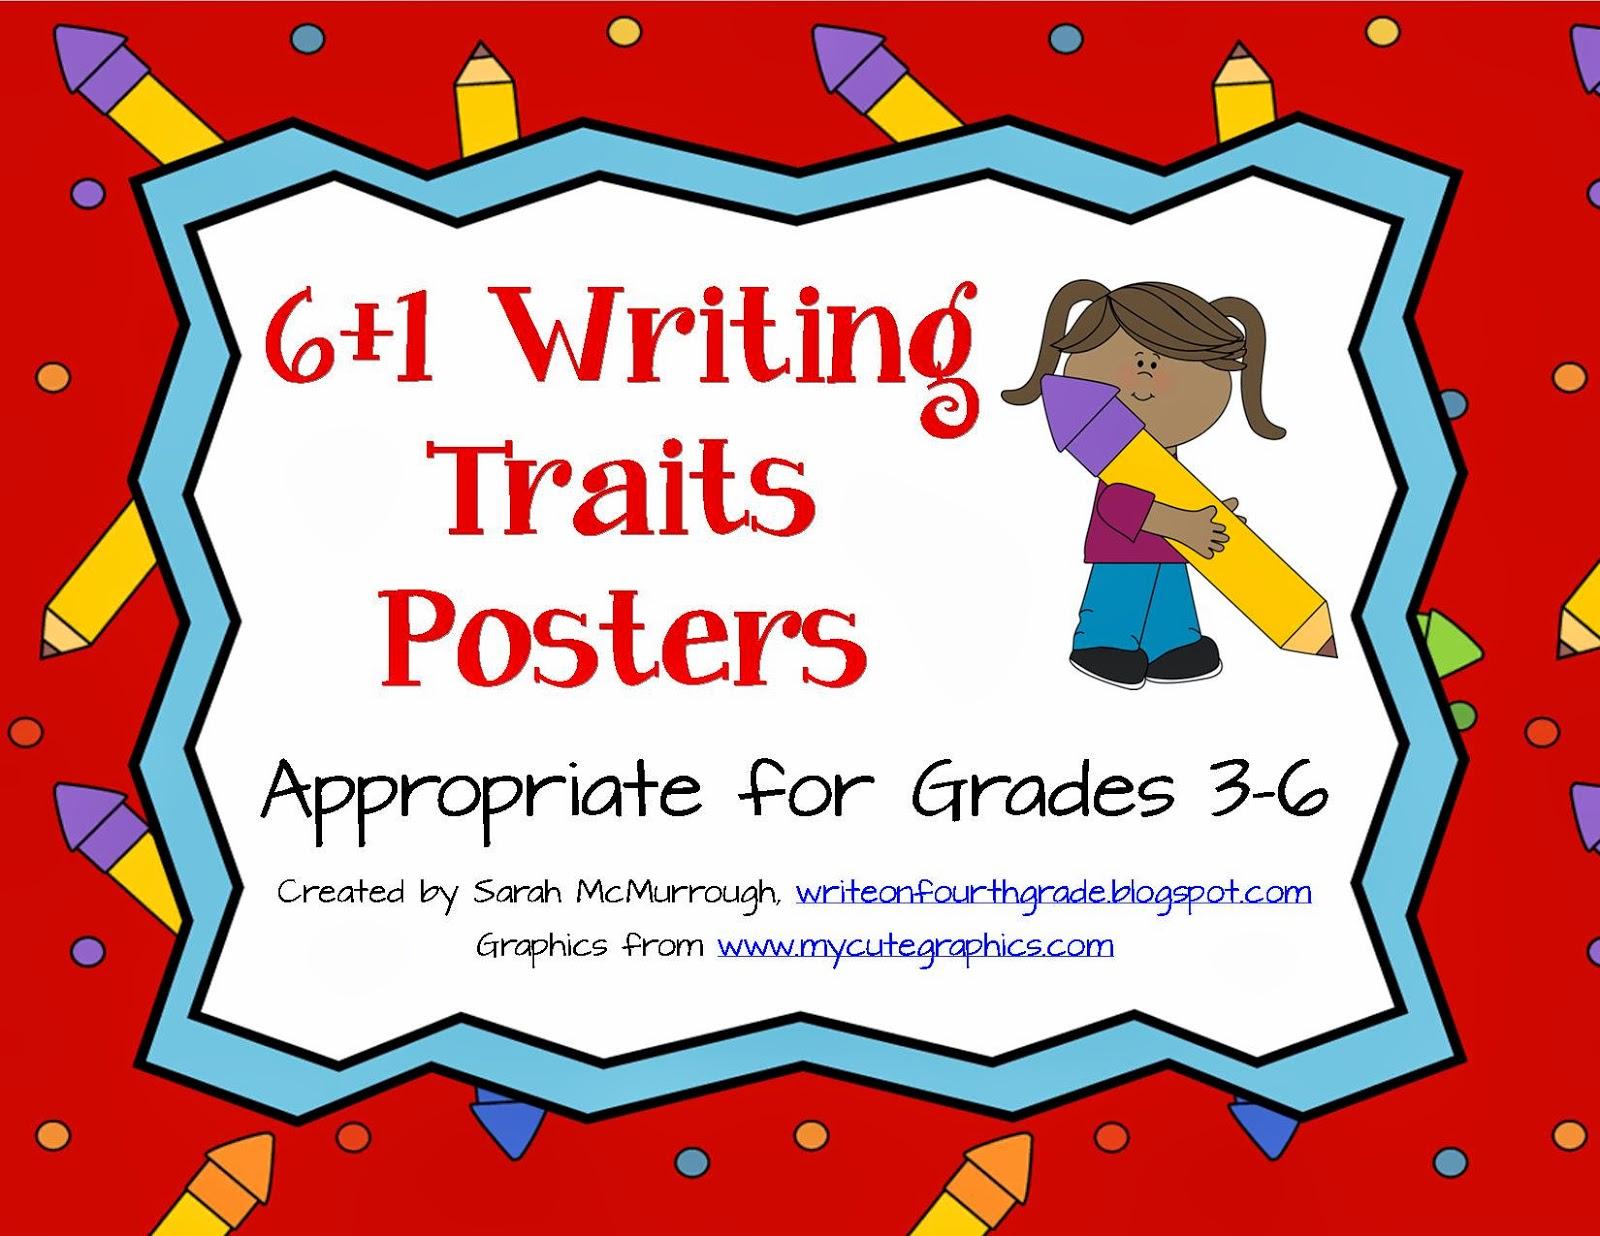 6 traits writing